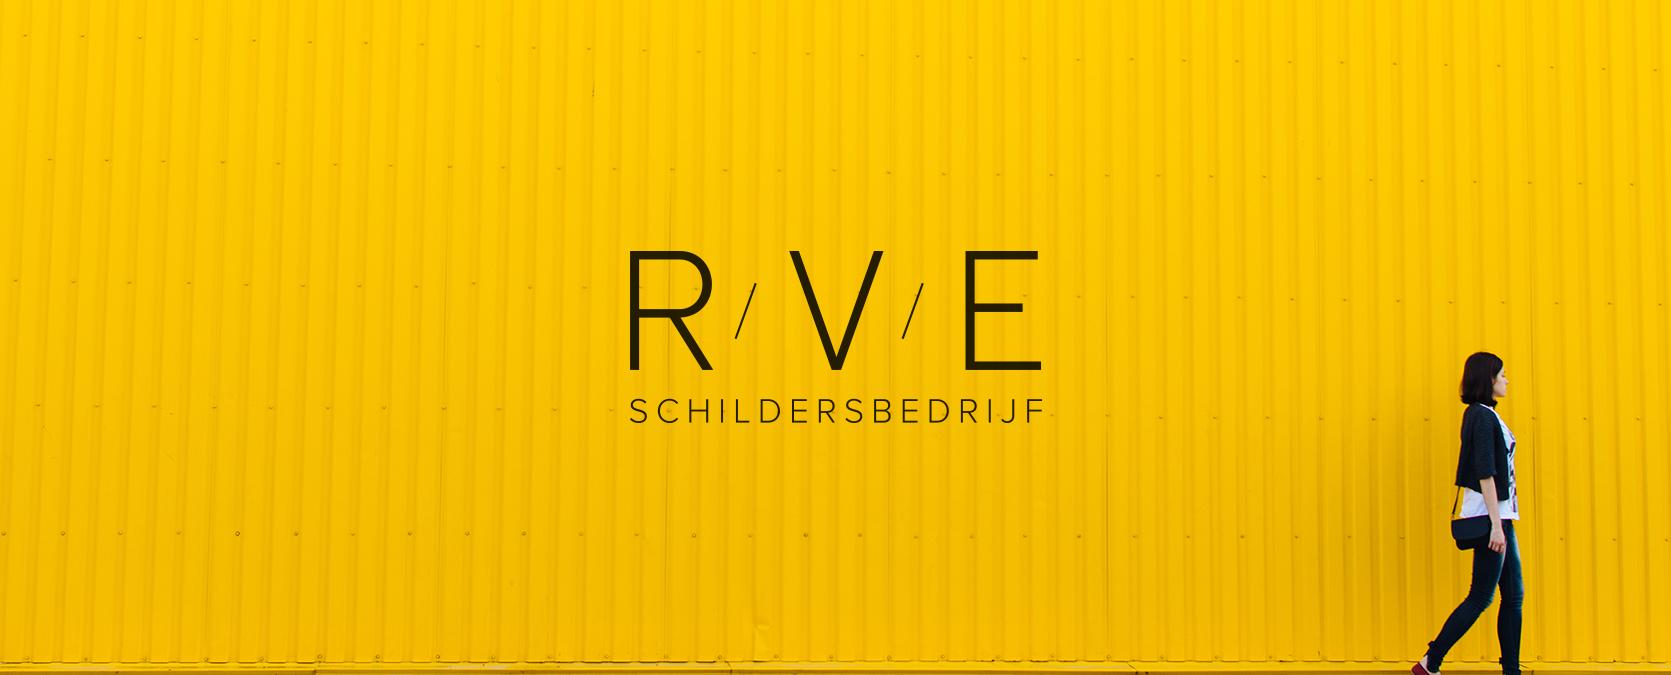 headerimage_RVE